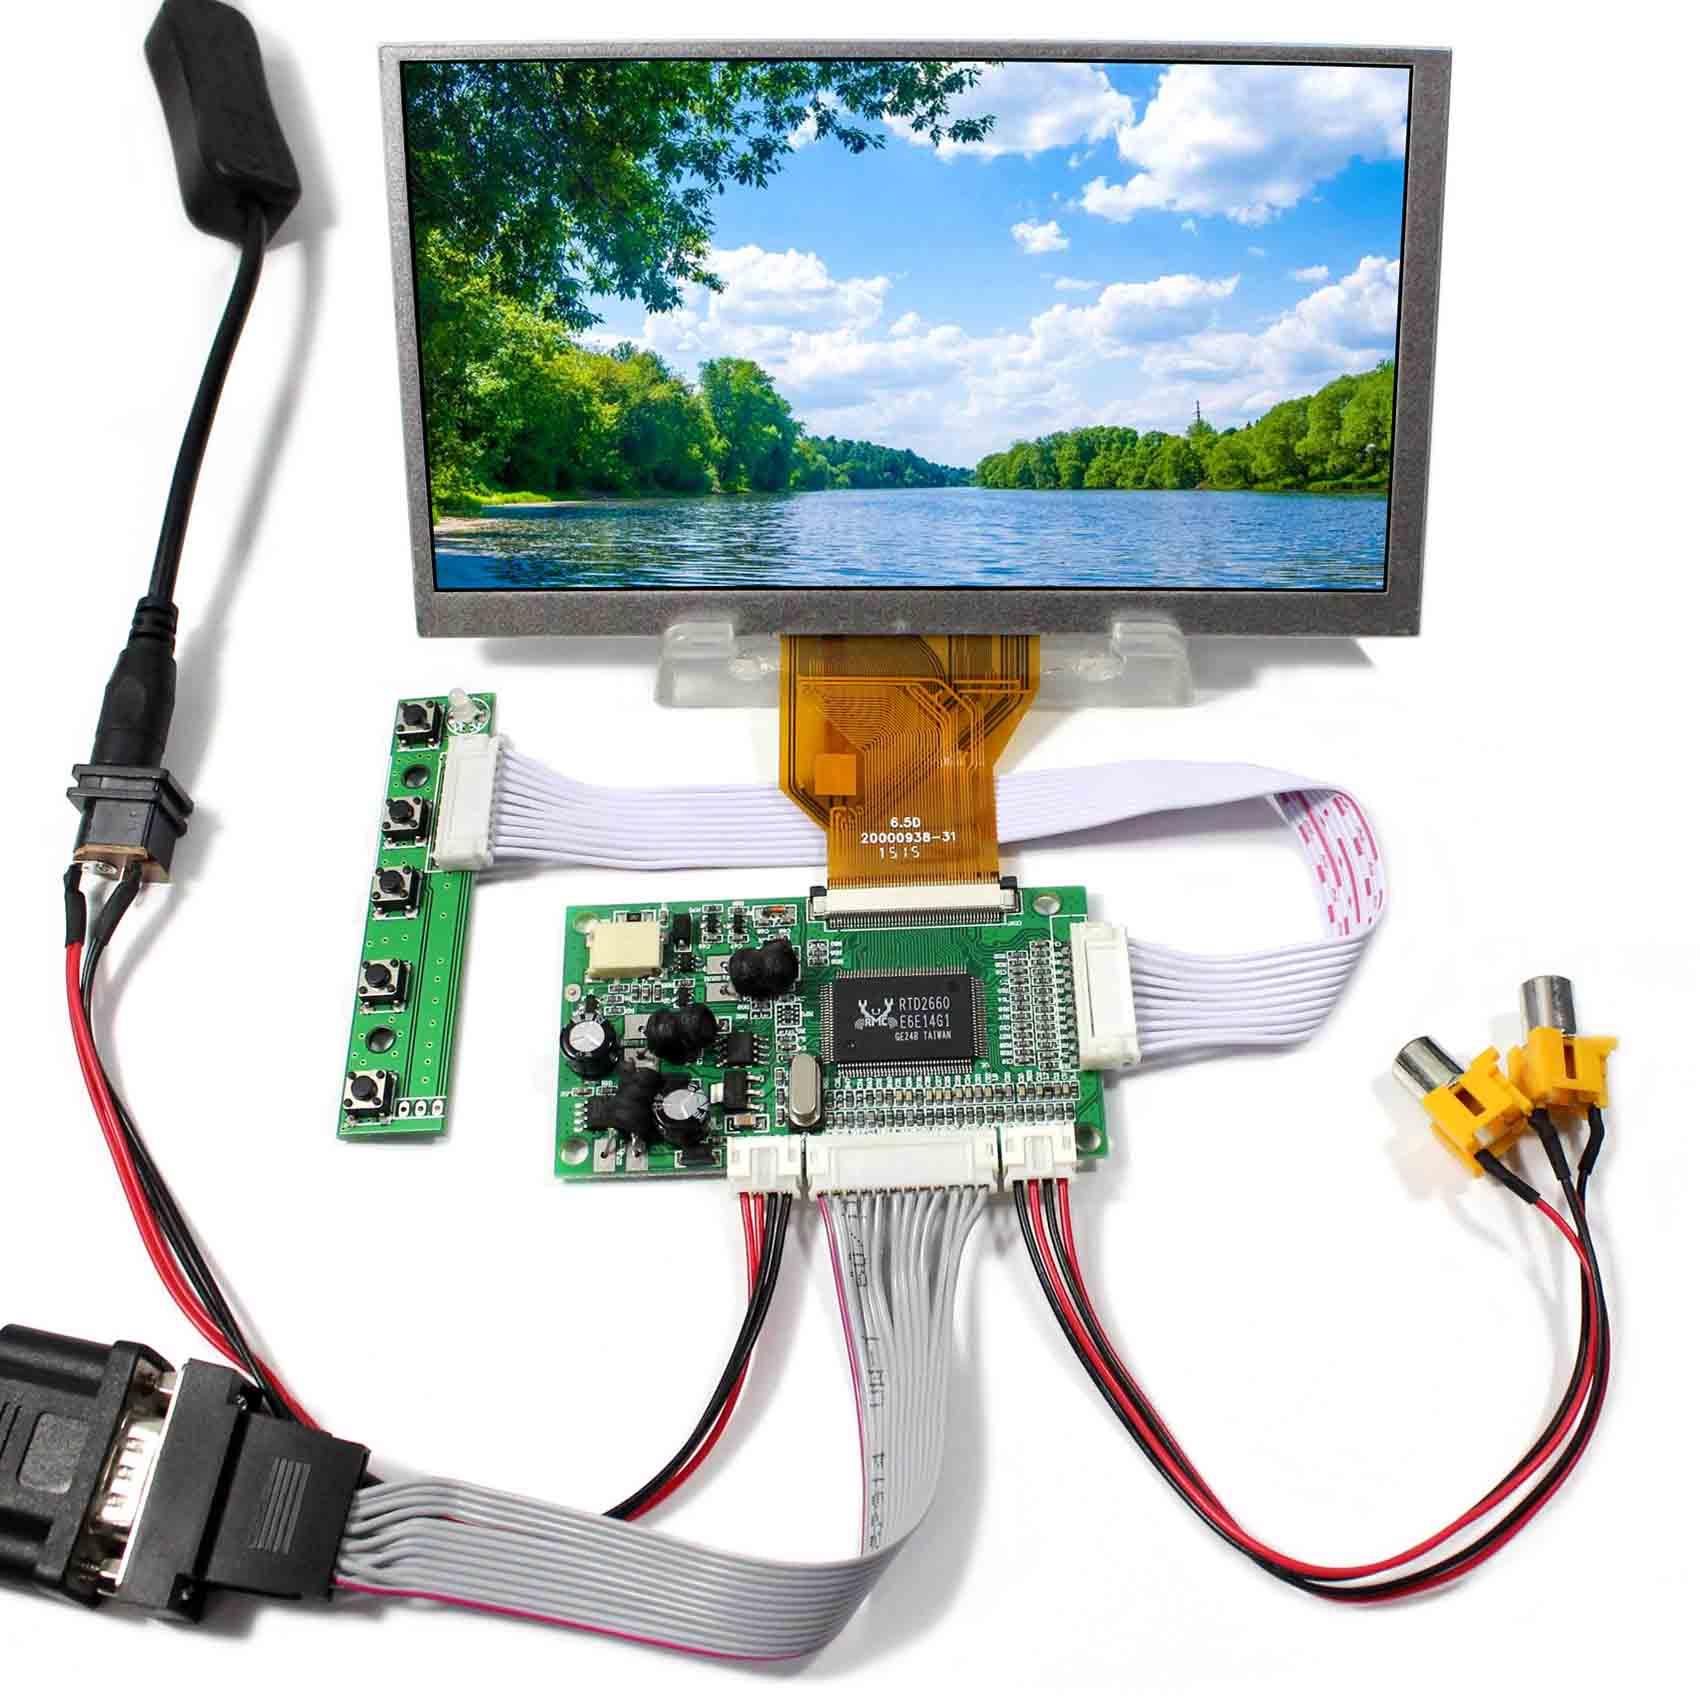 VGA+2AV Reversing LCD Driver Board+6.5inch 800x480 AT065TN14 LCD Screen vga 2av audio reversing lcd driver board 10 1inch n101bge 1366 768 lcd panel